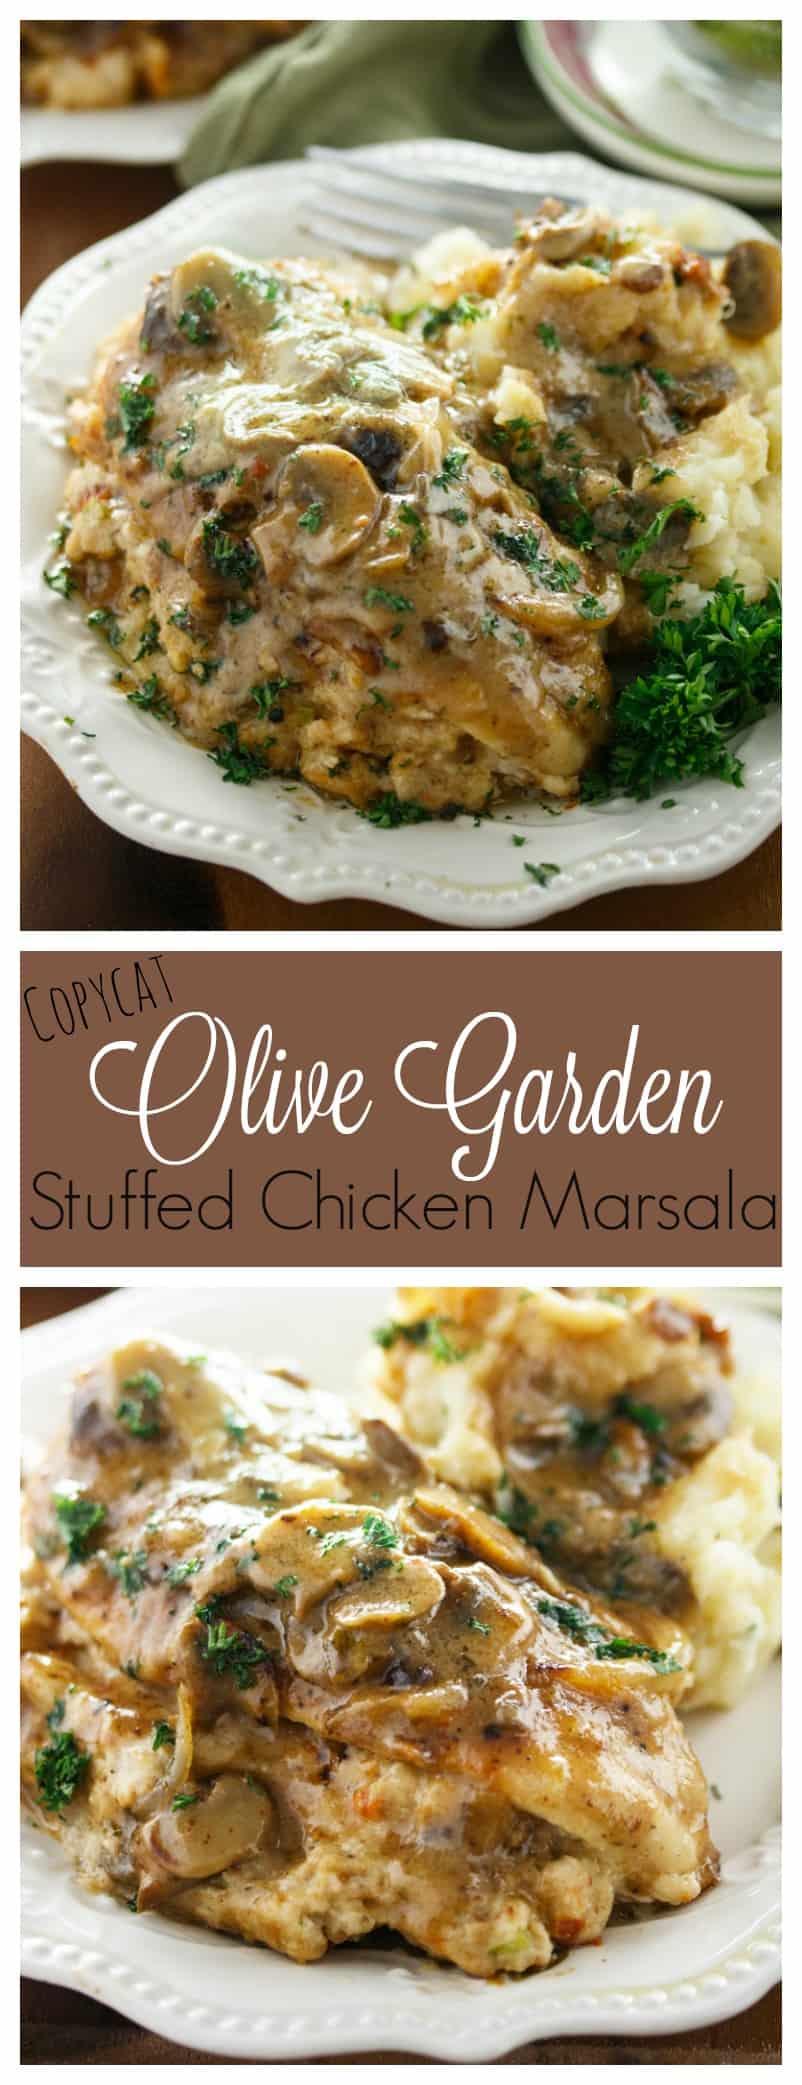 Copycat olive garden stuffed chicken marsala the cozy cook for Olive garden stuffed mushroom recipe